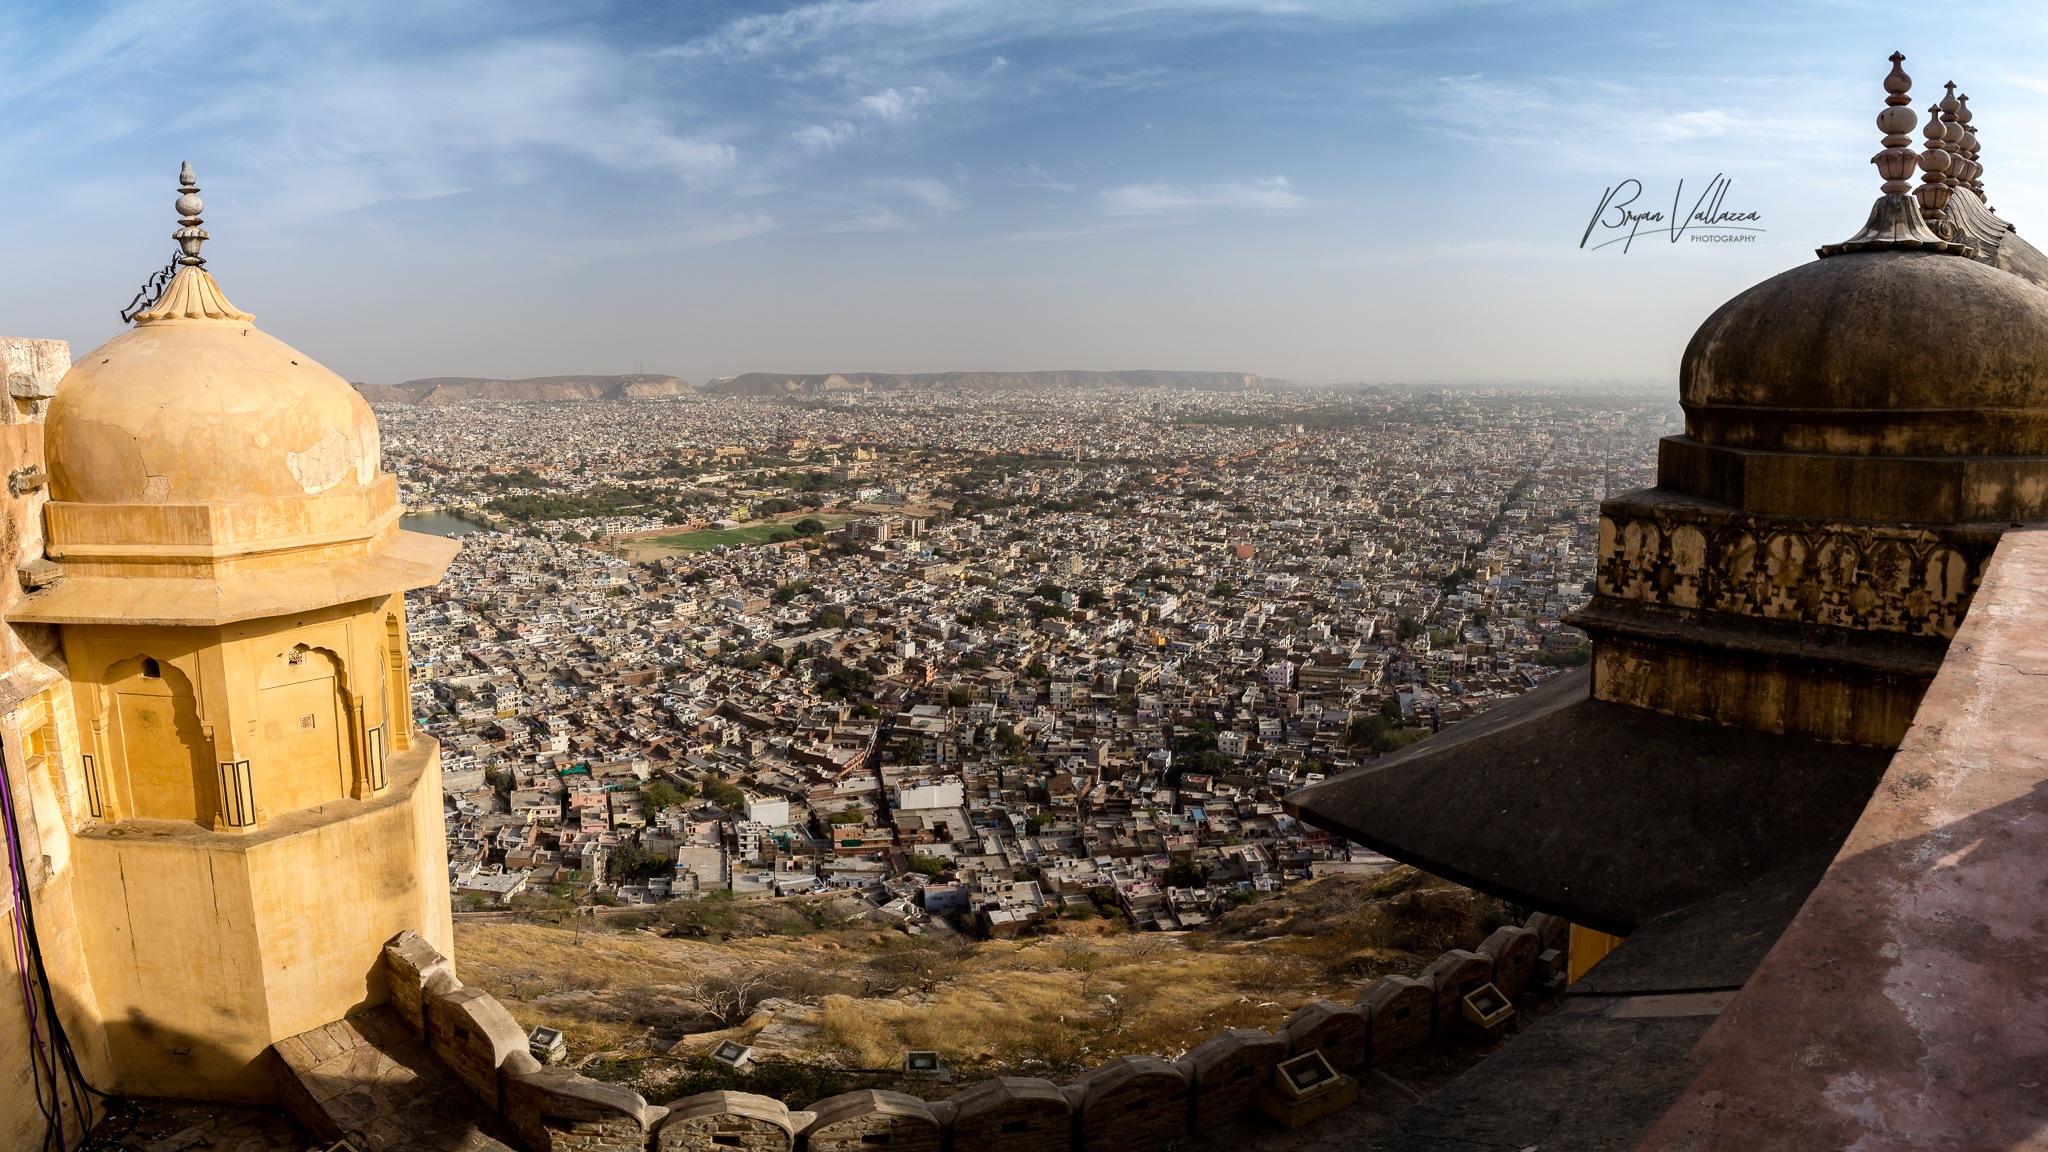 Jaipur by bryanvallazza